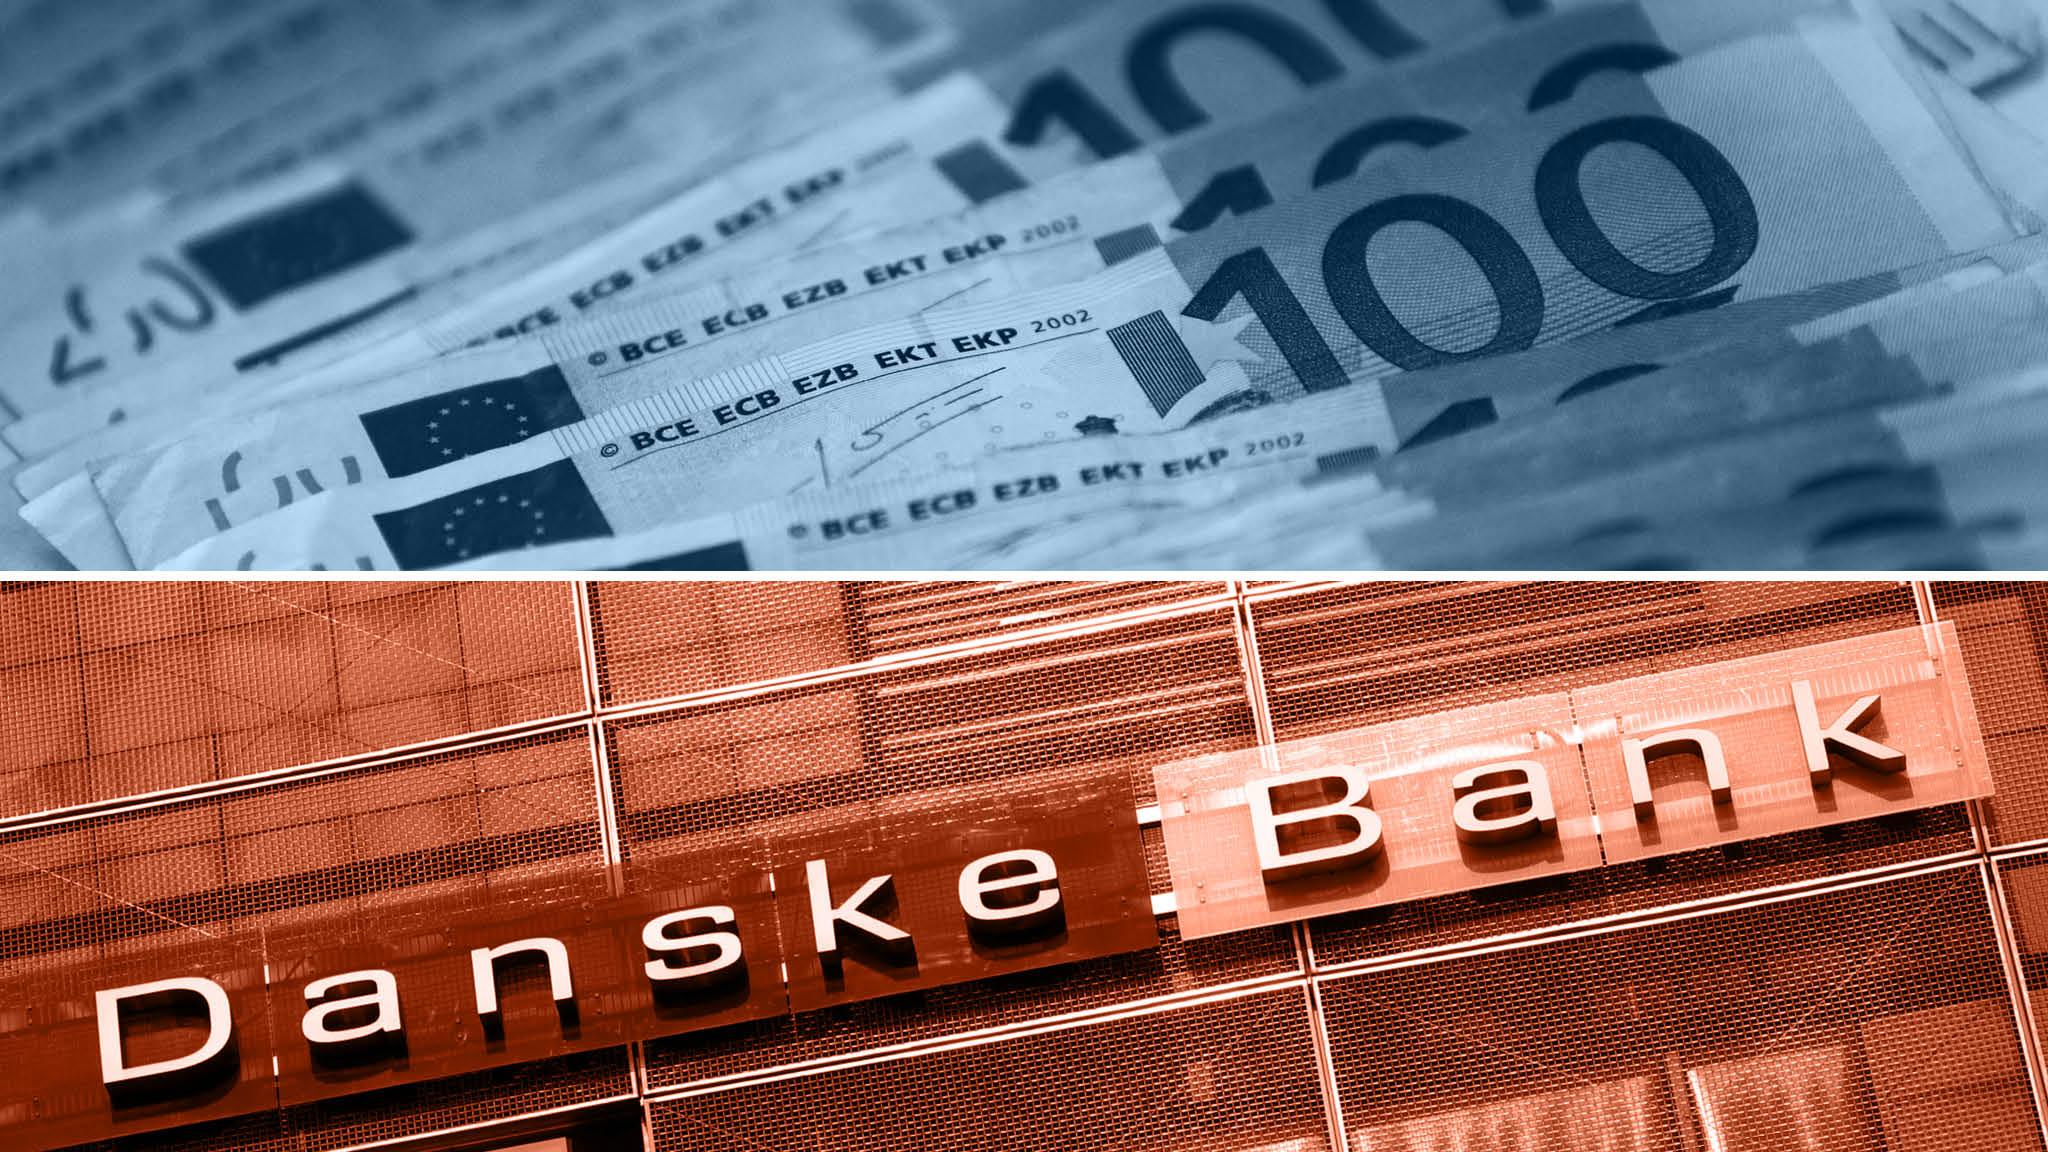 Картинки по запросу scandal deutsche bank danske bank